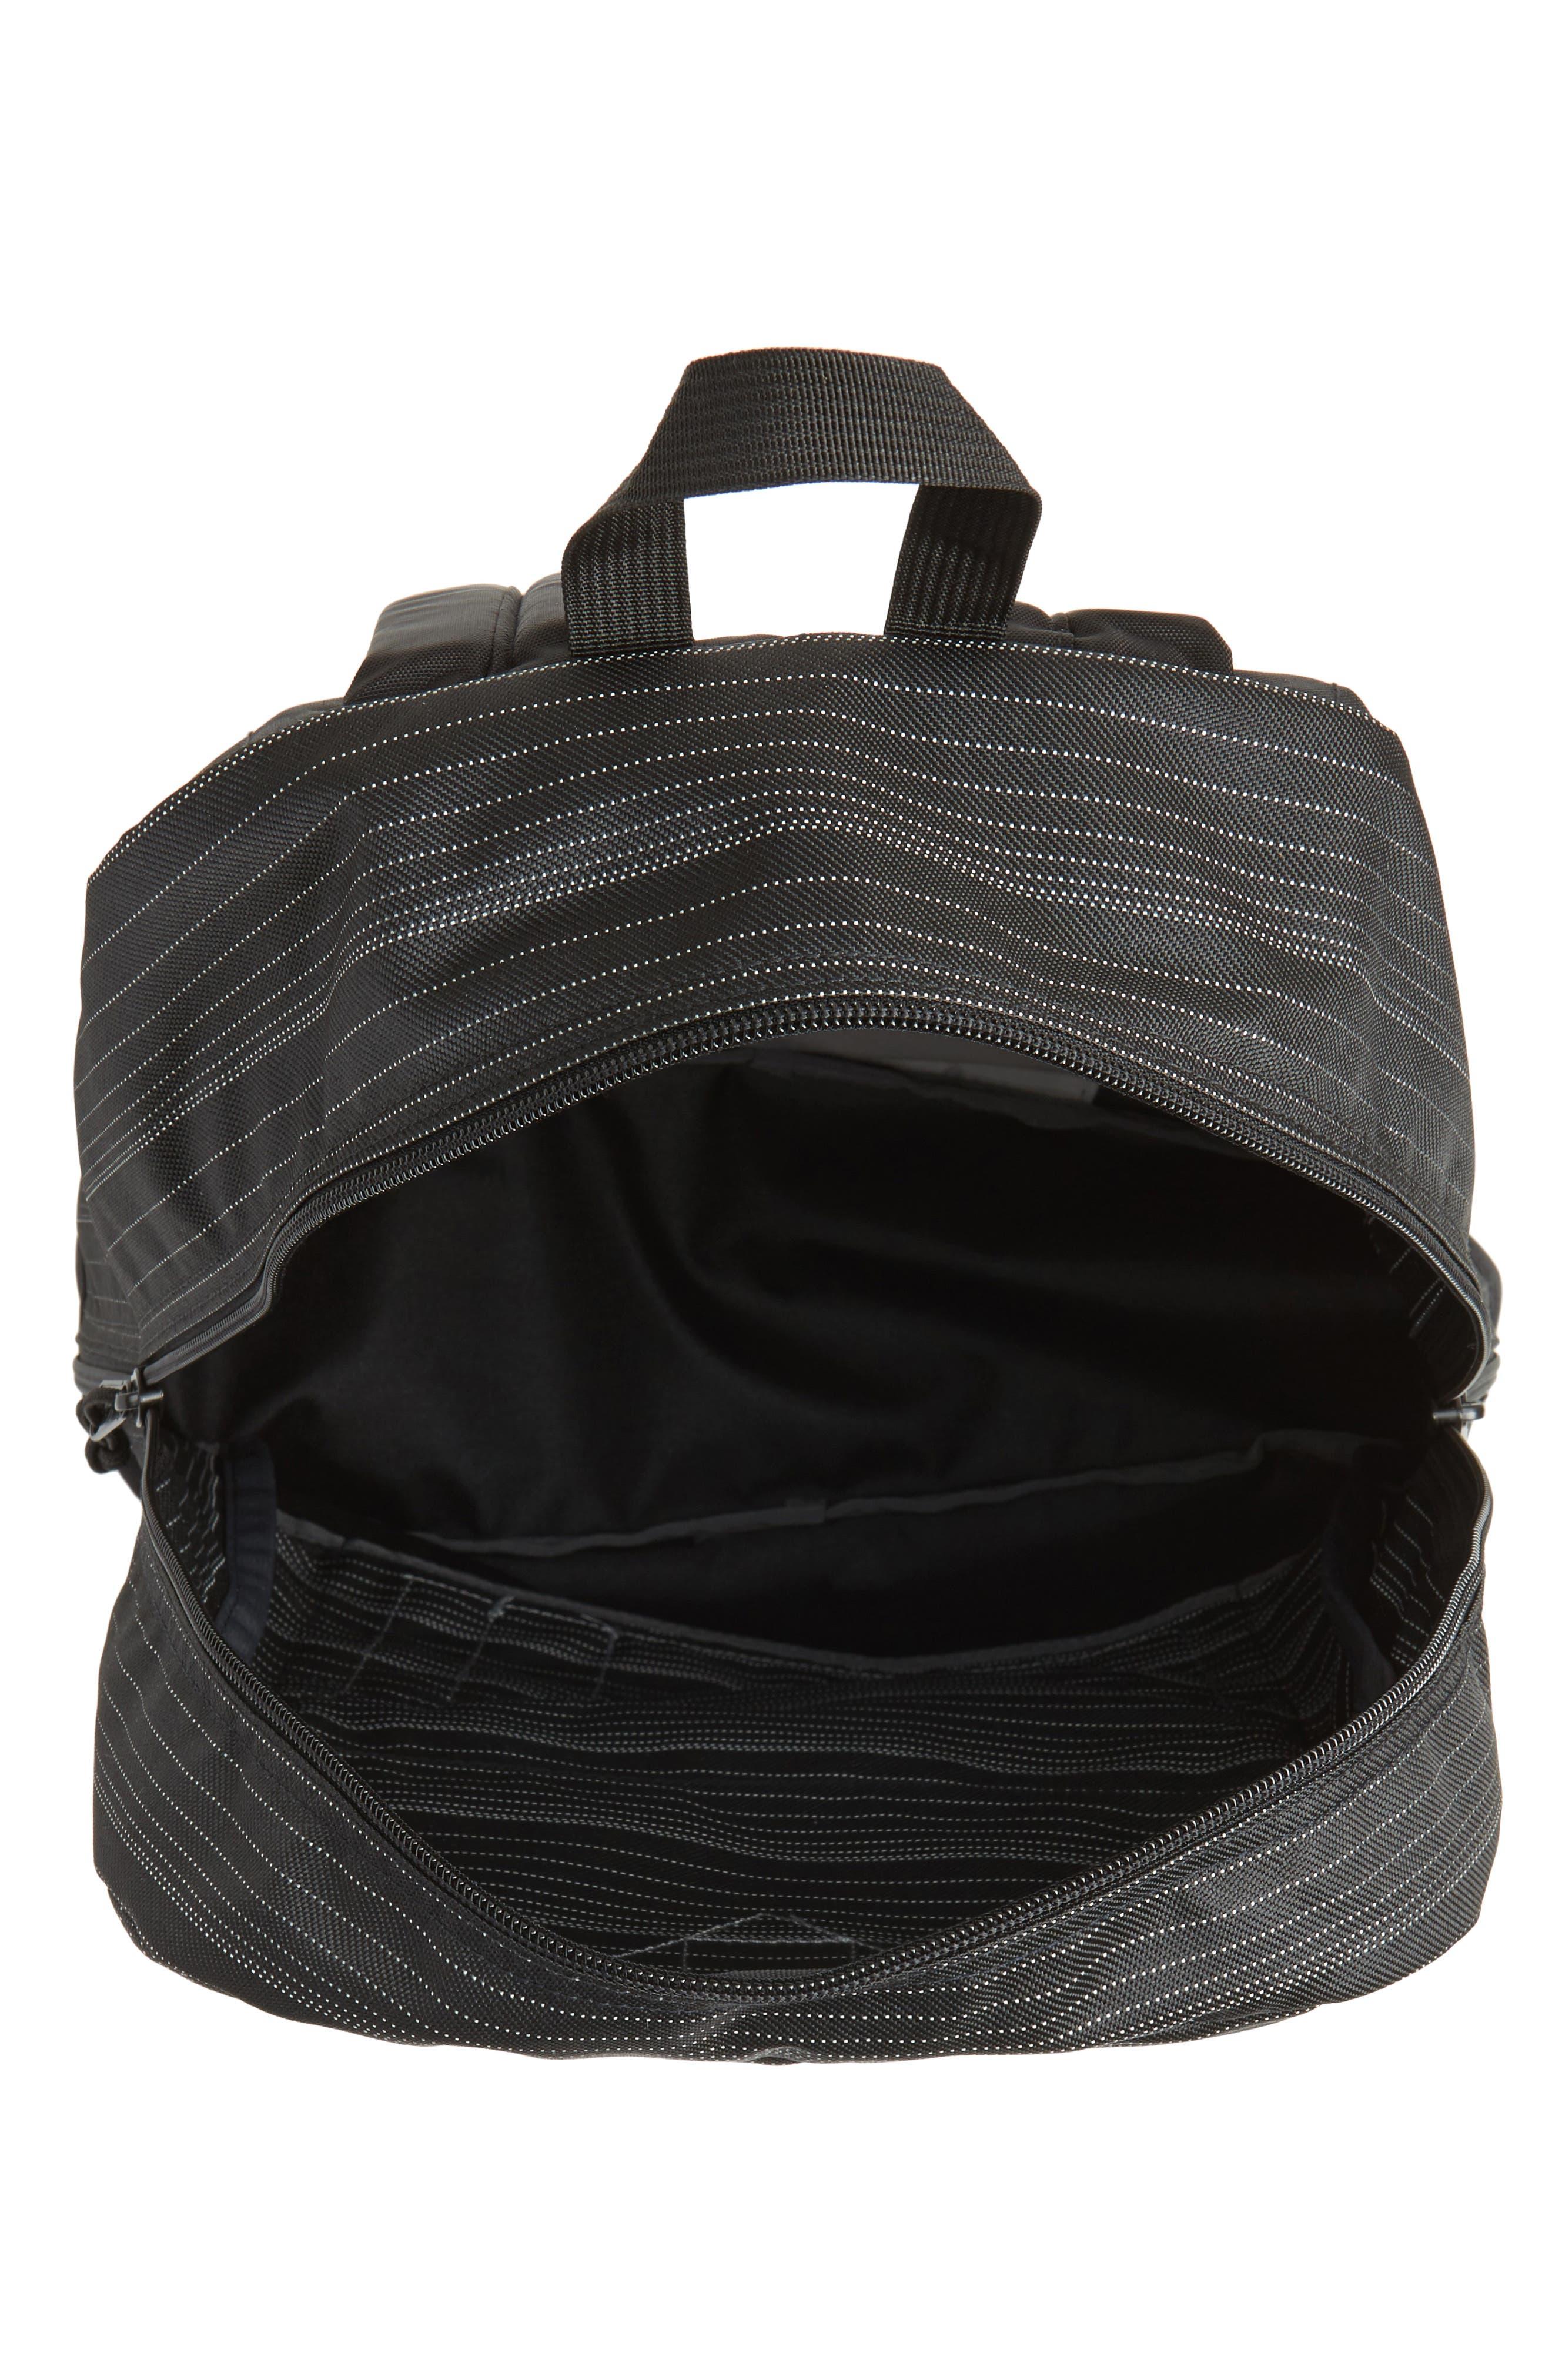 Super FX Reflective Backpack,                             Alternate thumbnail 4, color,                             020